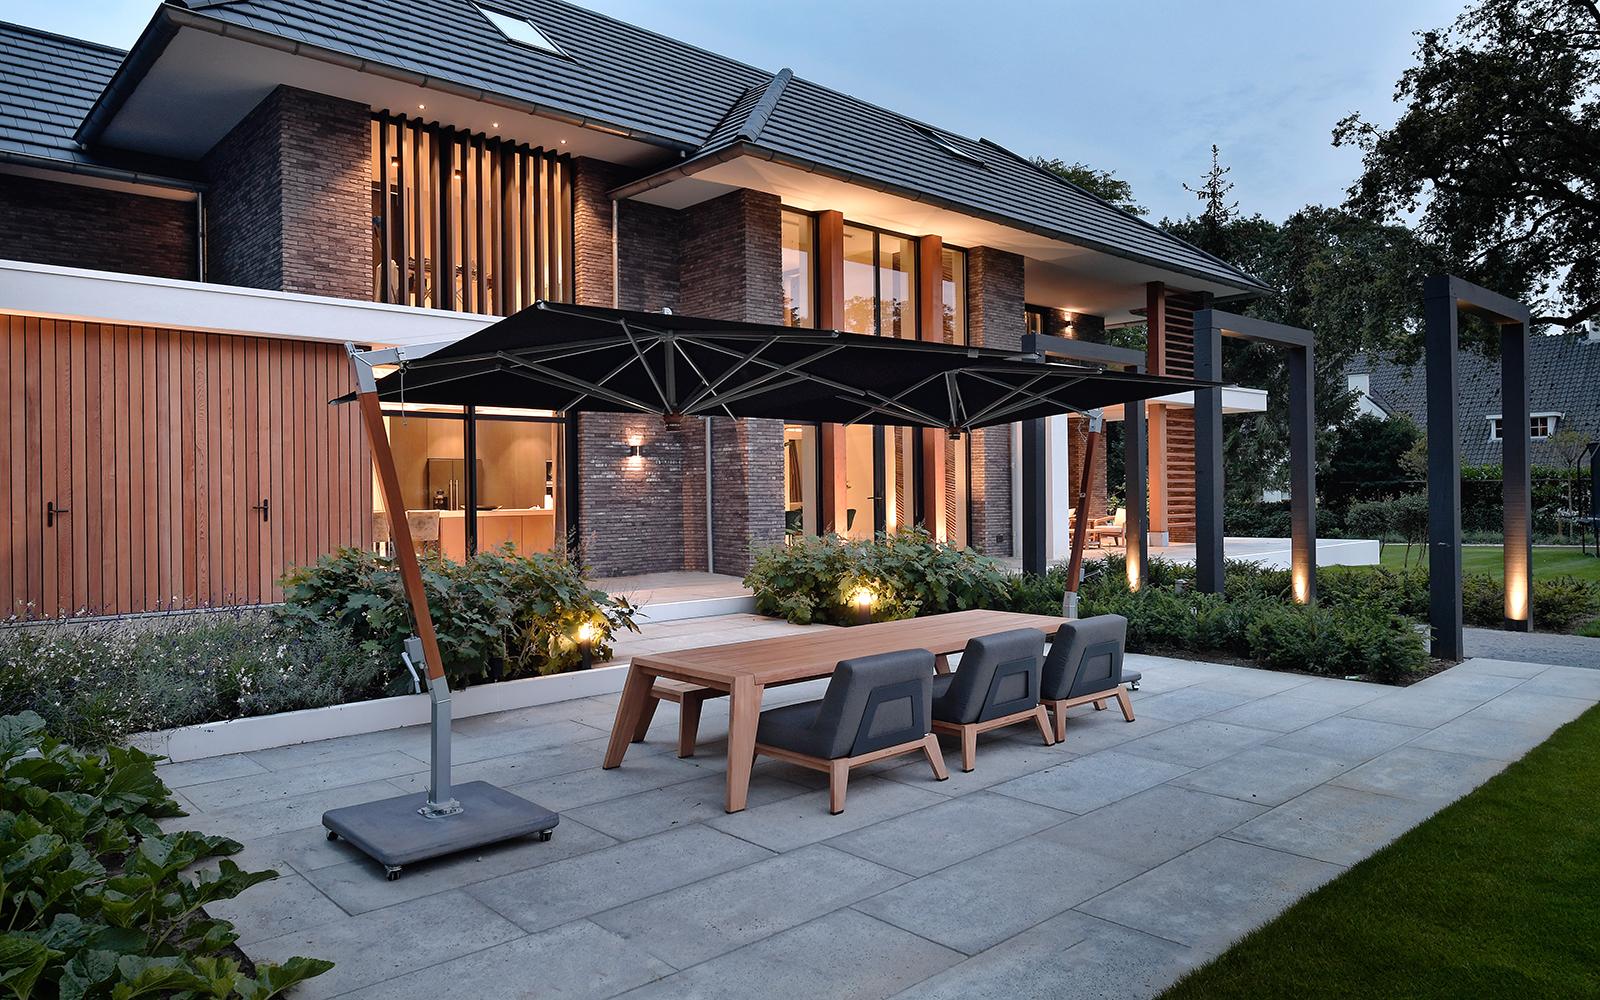 Buitenmeubilair, Tuin loungeset, Design tuinmeubels, Borek, Tuinmeubelen